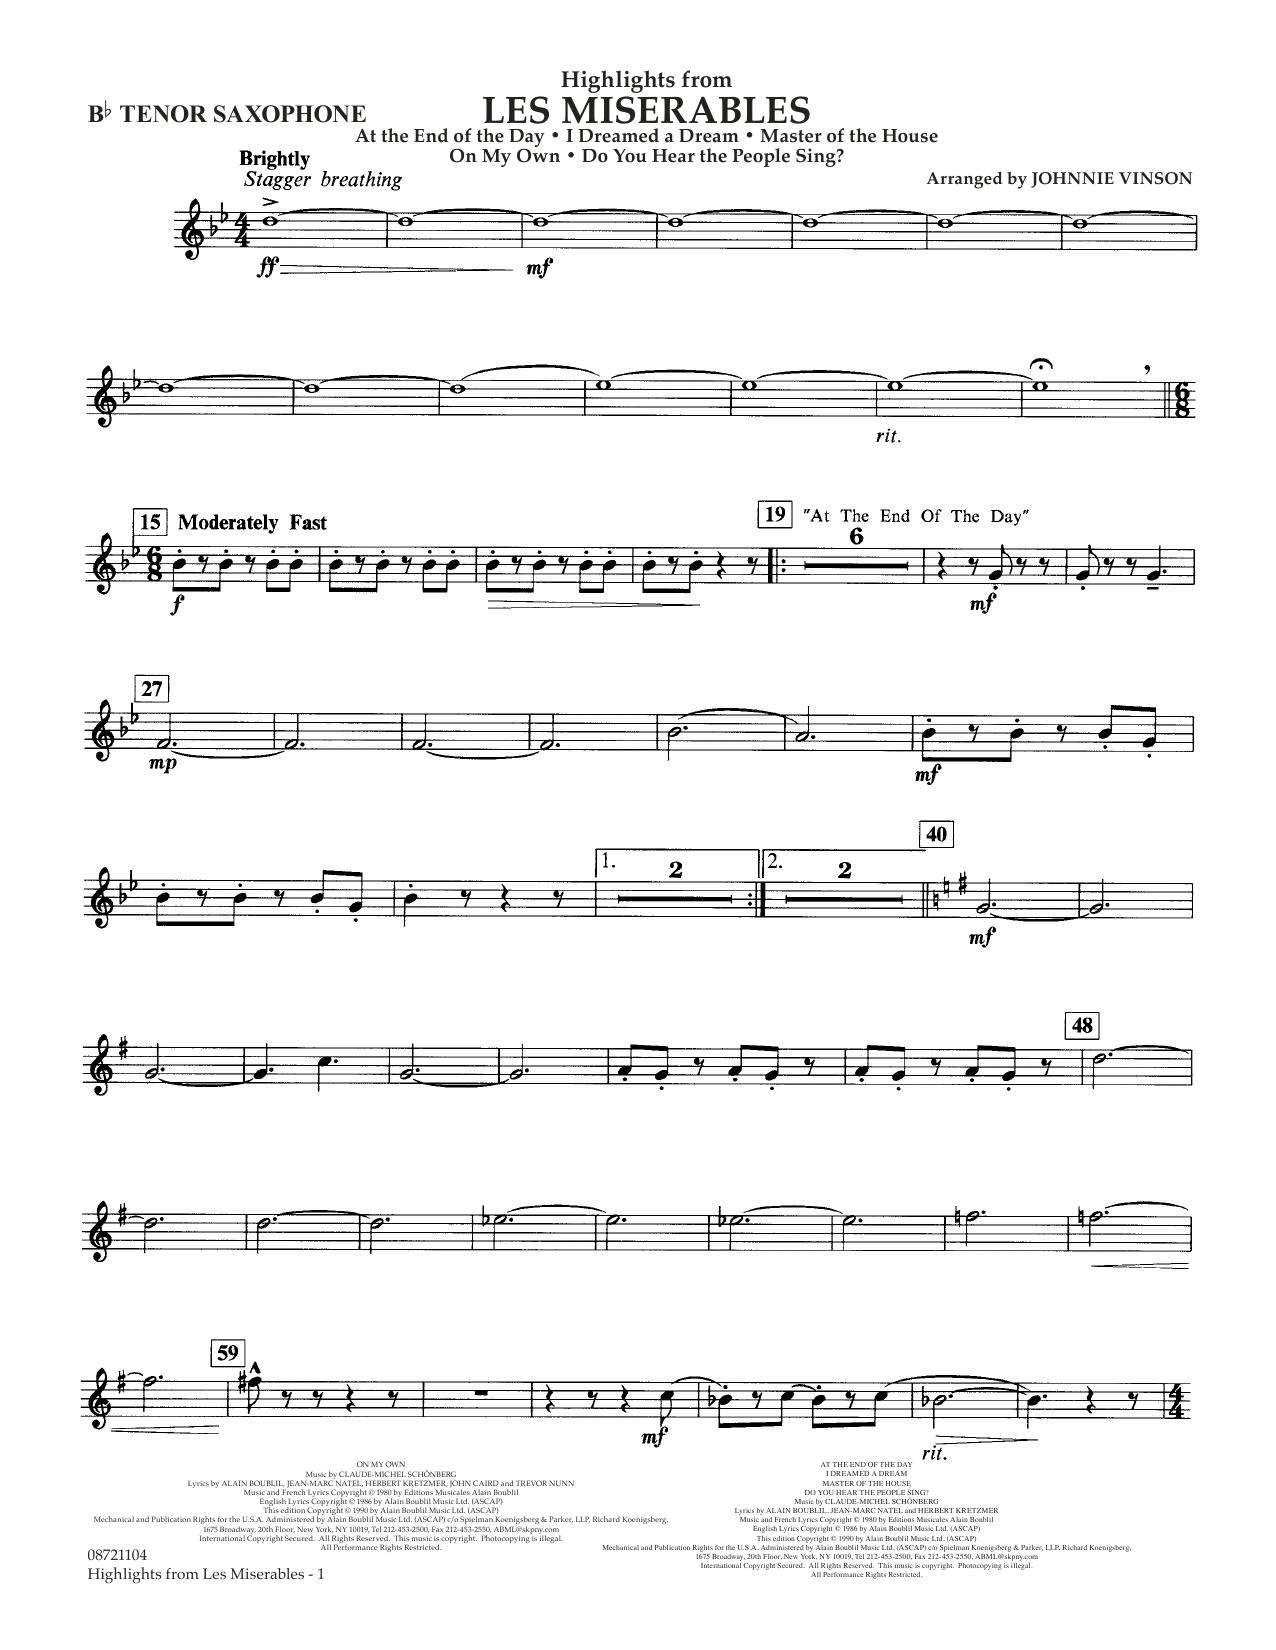 Highlights from Les Misérables (arr. Johnnie Vinson) - Bb Tenor Sax (Concert Band)